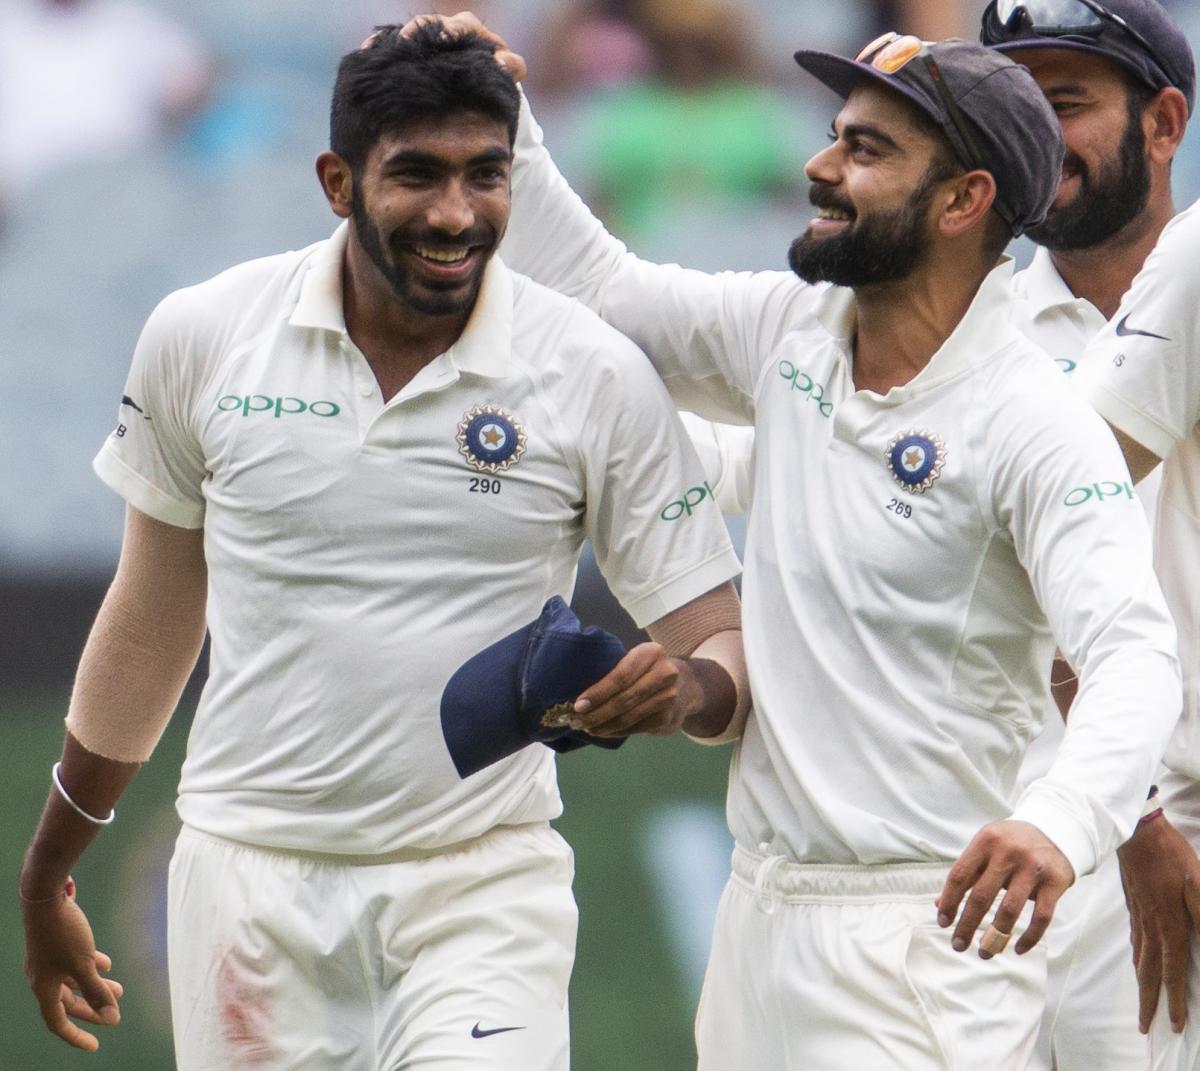 WELL DONE! India's Virat Kohli (right) celebrates with Jasprit Bumrah the dismissal of Australia's Shaun Marsh. AFP/PTI